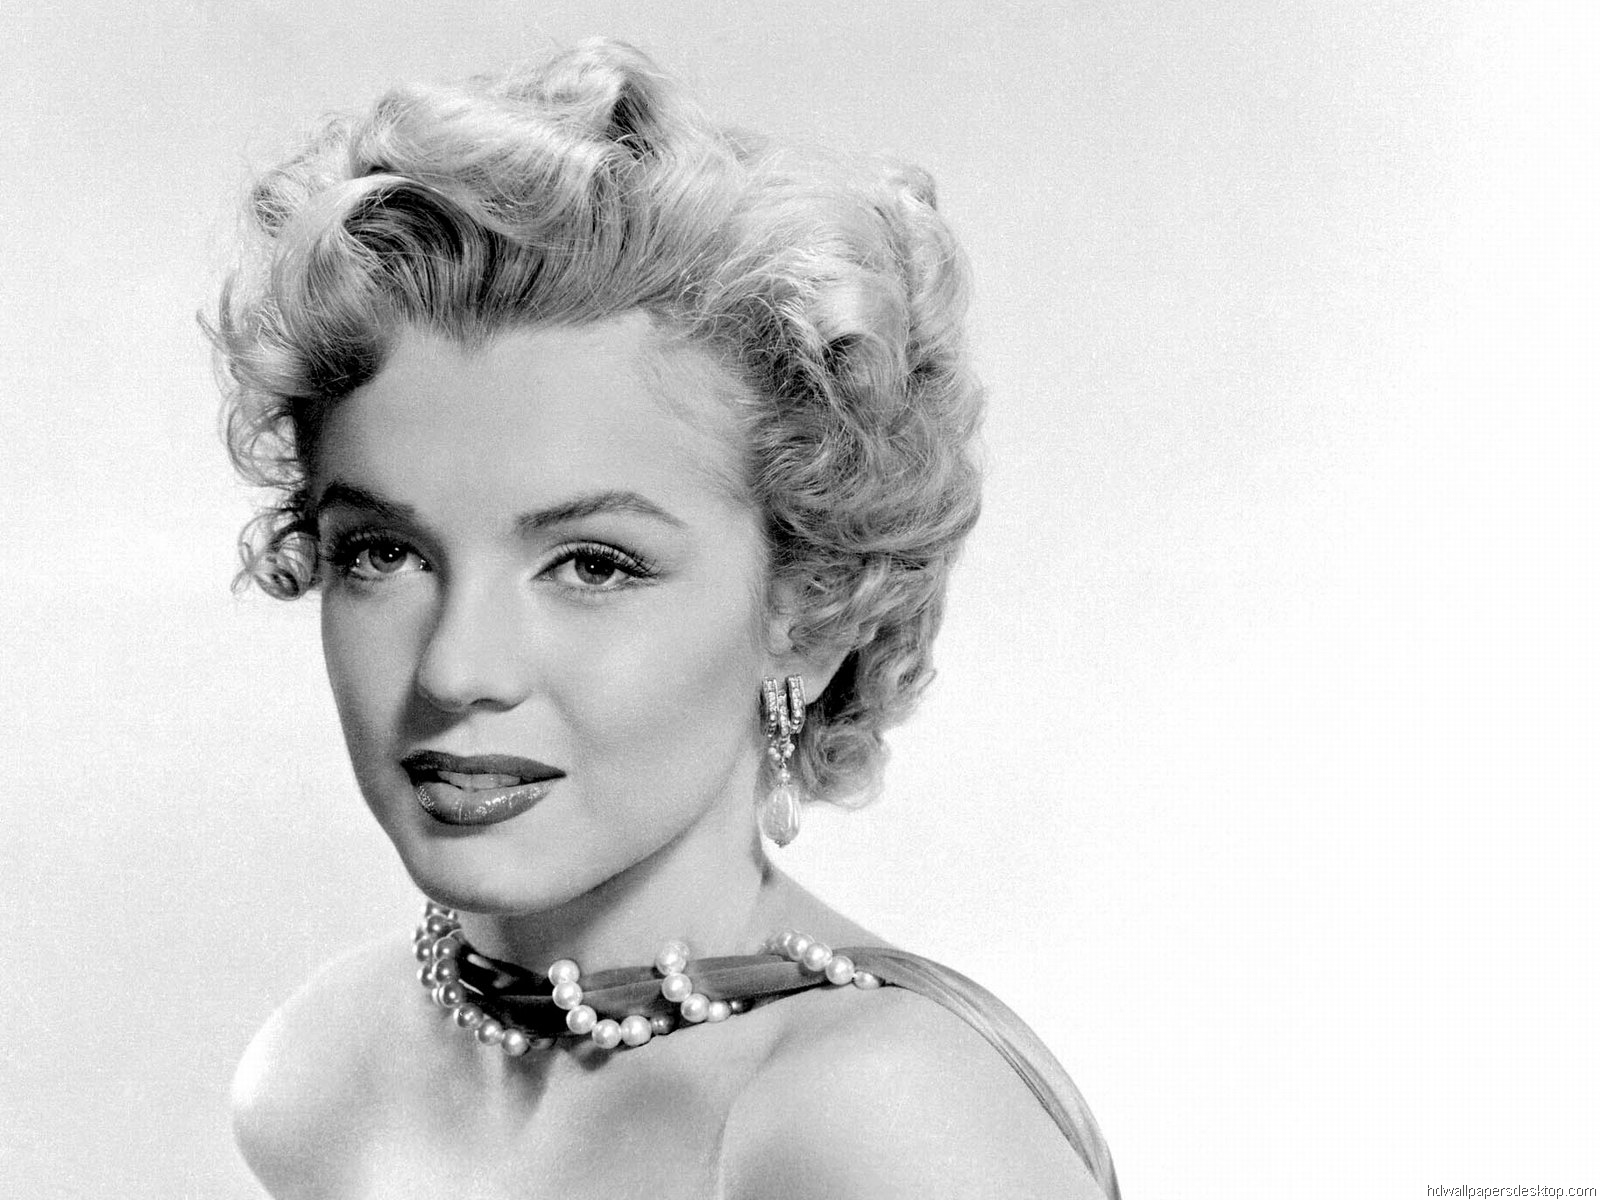 Citaten Marilyn Monroe Hd : Wallpapers de marilyn monroe taringa